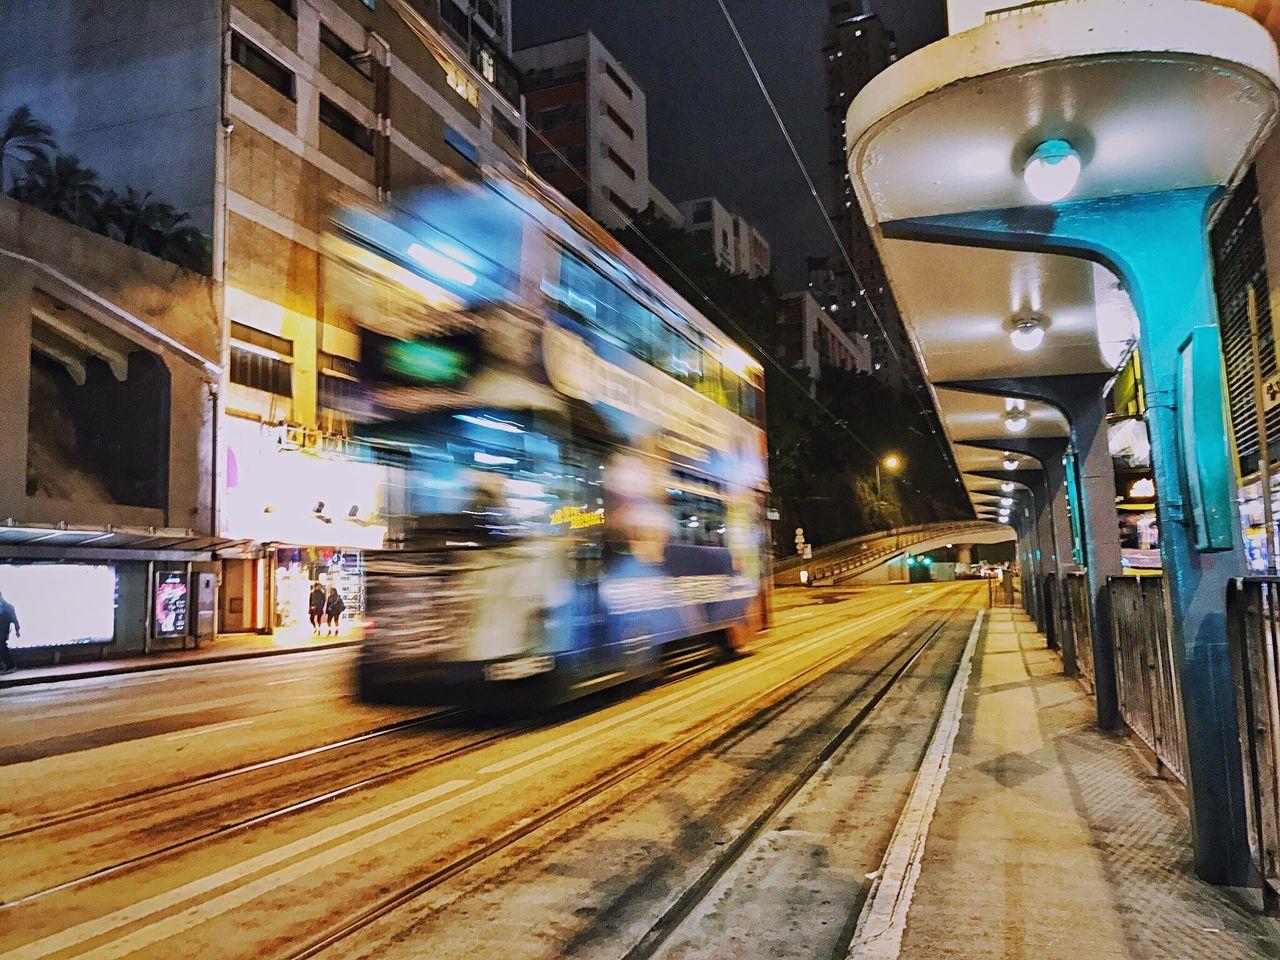 transportation, blurred motion, mode of transport, speed, motion, illuminated, public transportation, built structure, railroad track, rail transportation, night, long exposure, land vehicle, men, outdoors, architecture, sky, people